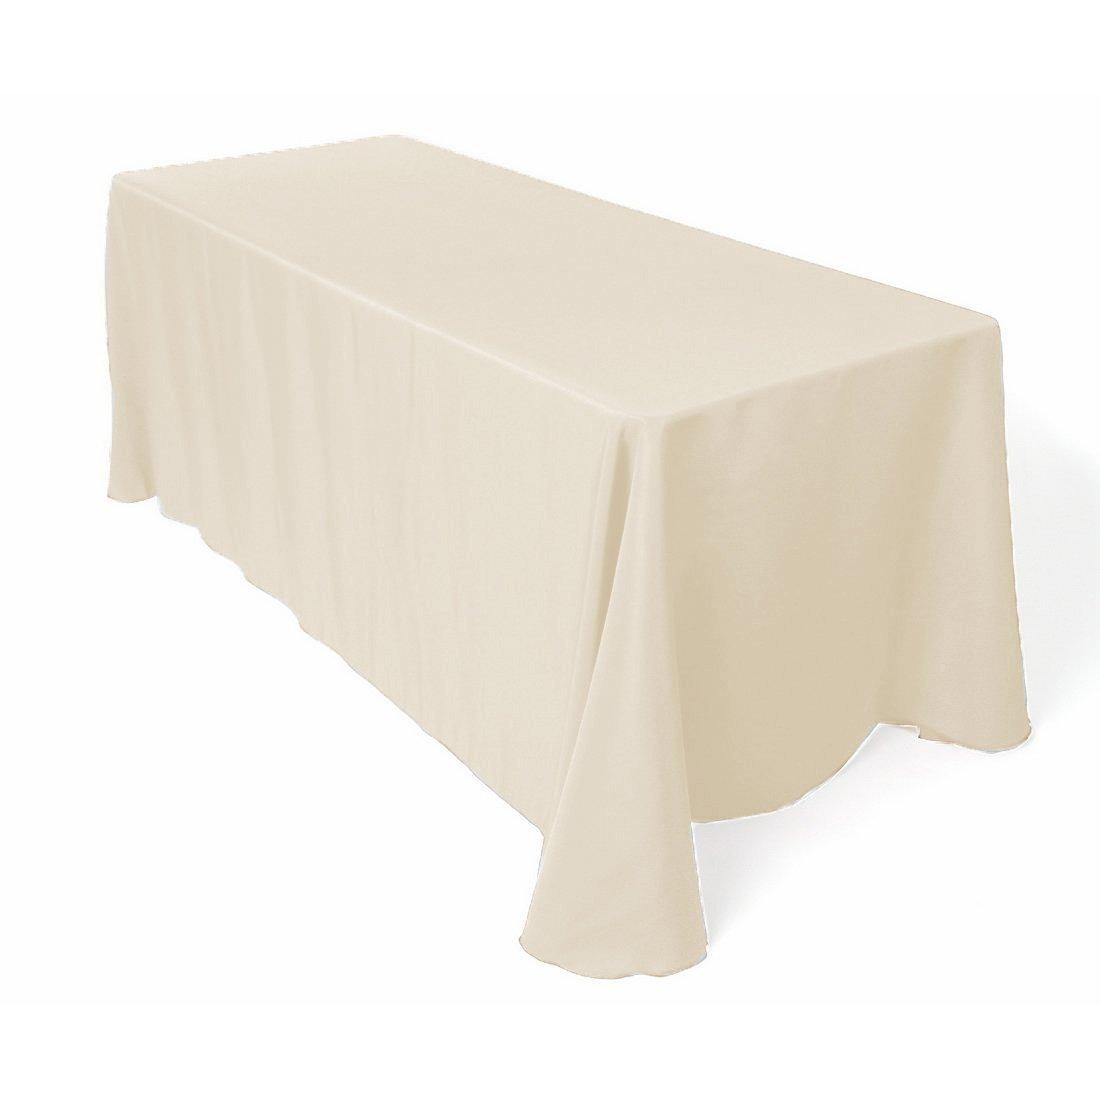 Gee Di Moda Rectangle Tablecloth Beige